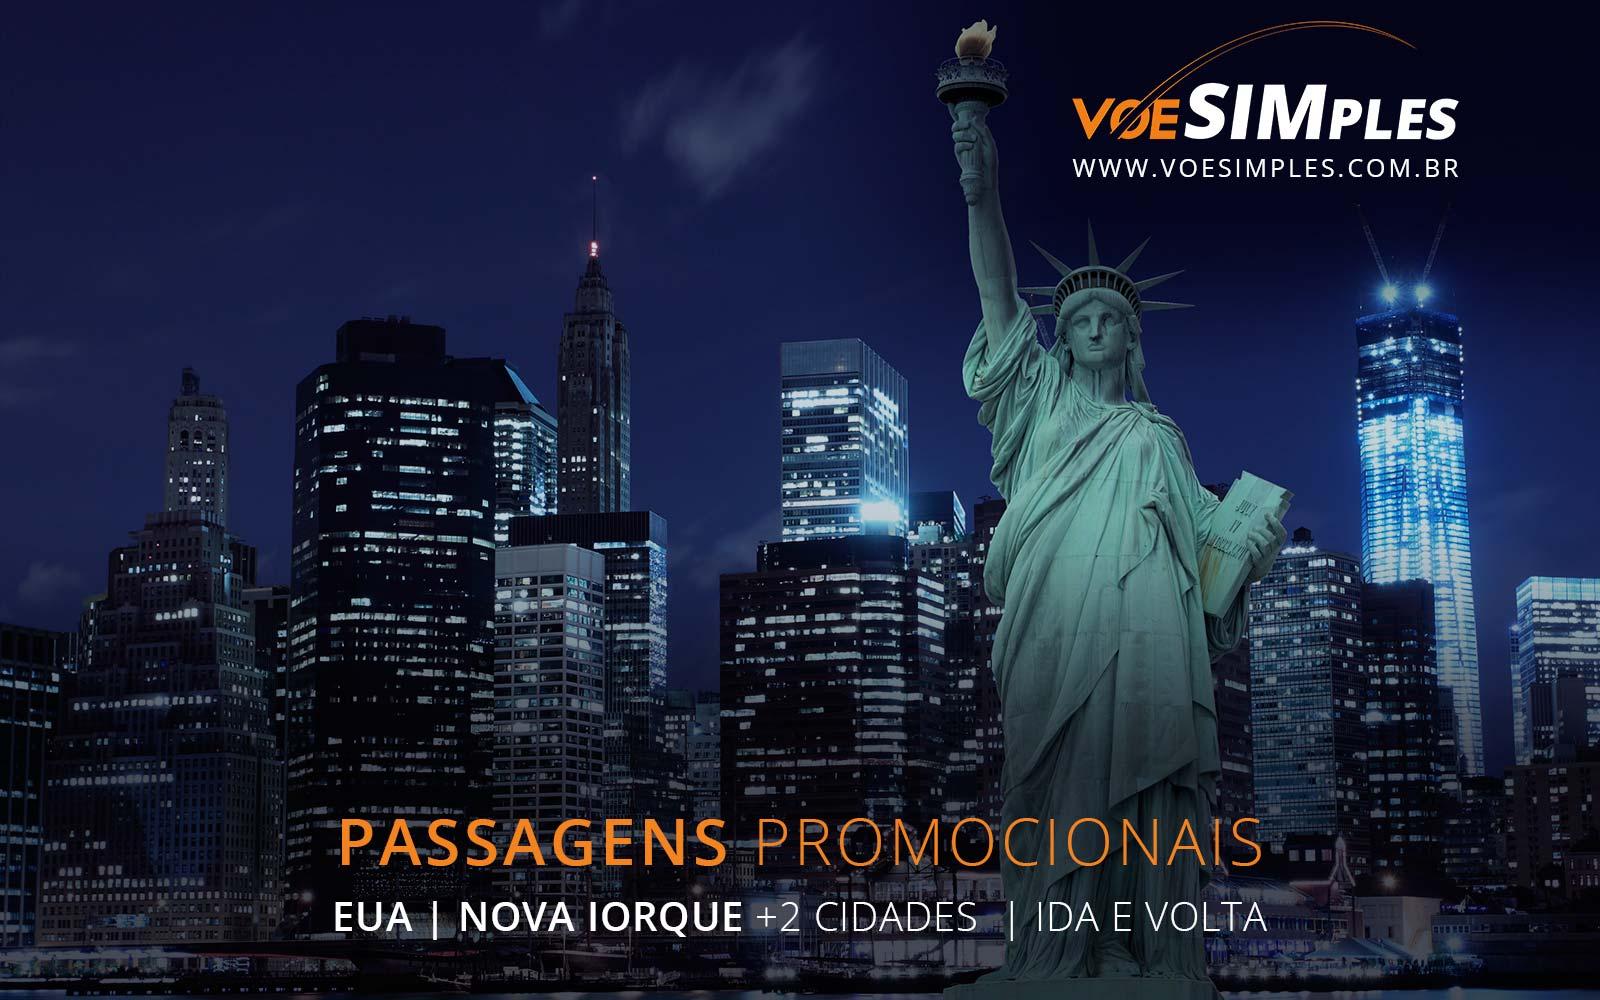 Passagens aéreas promocionais para Nova York, Washington e Baltimore nos Estados Unidos